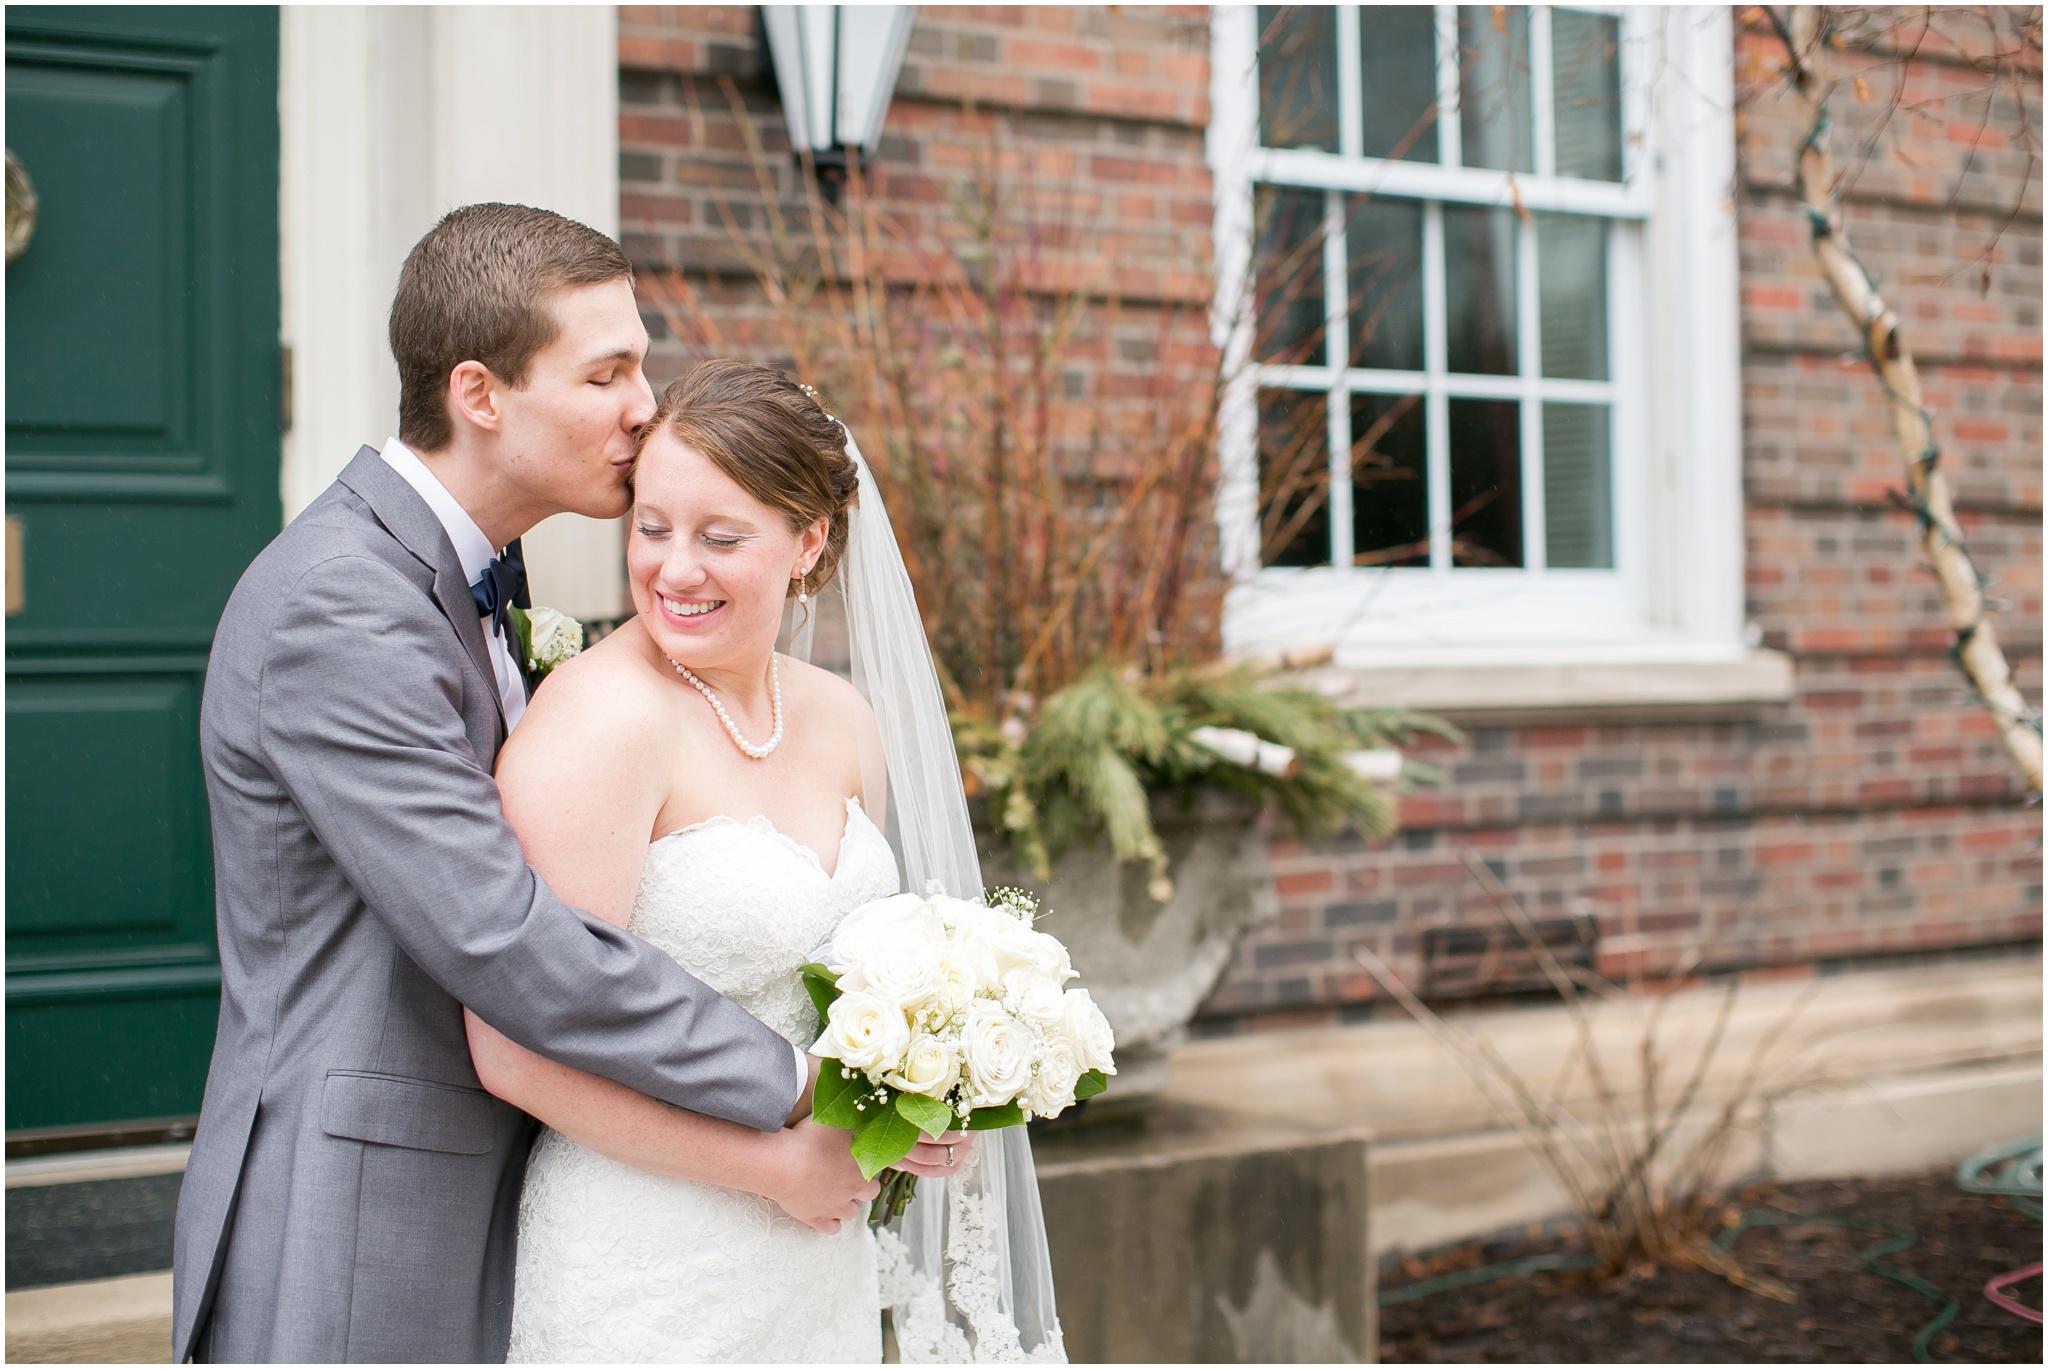 Madison_Club_Madison_Wisconsin_Wedding_Photographer_Spring_Rainy_Wedding_2629.jpg